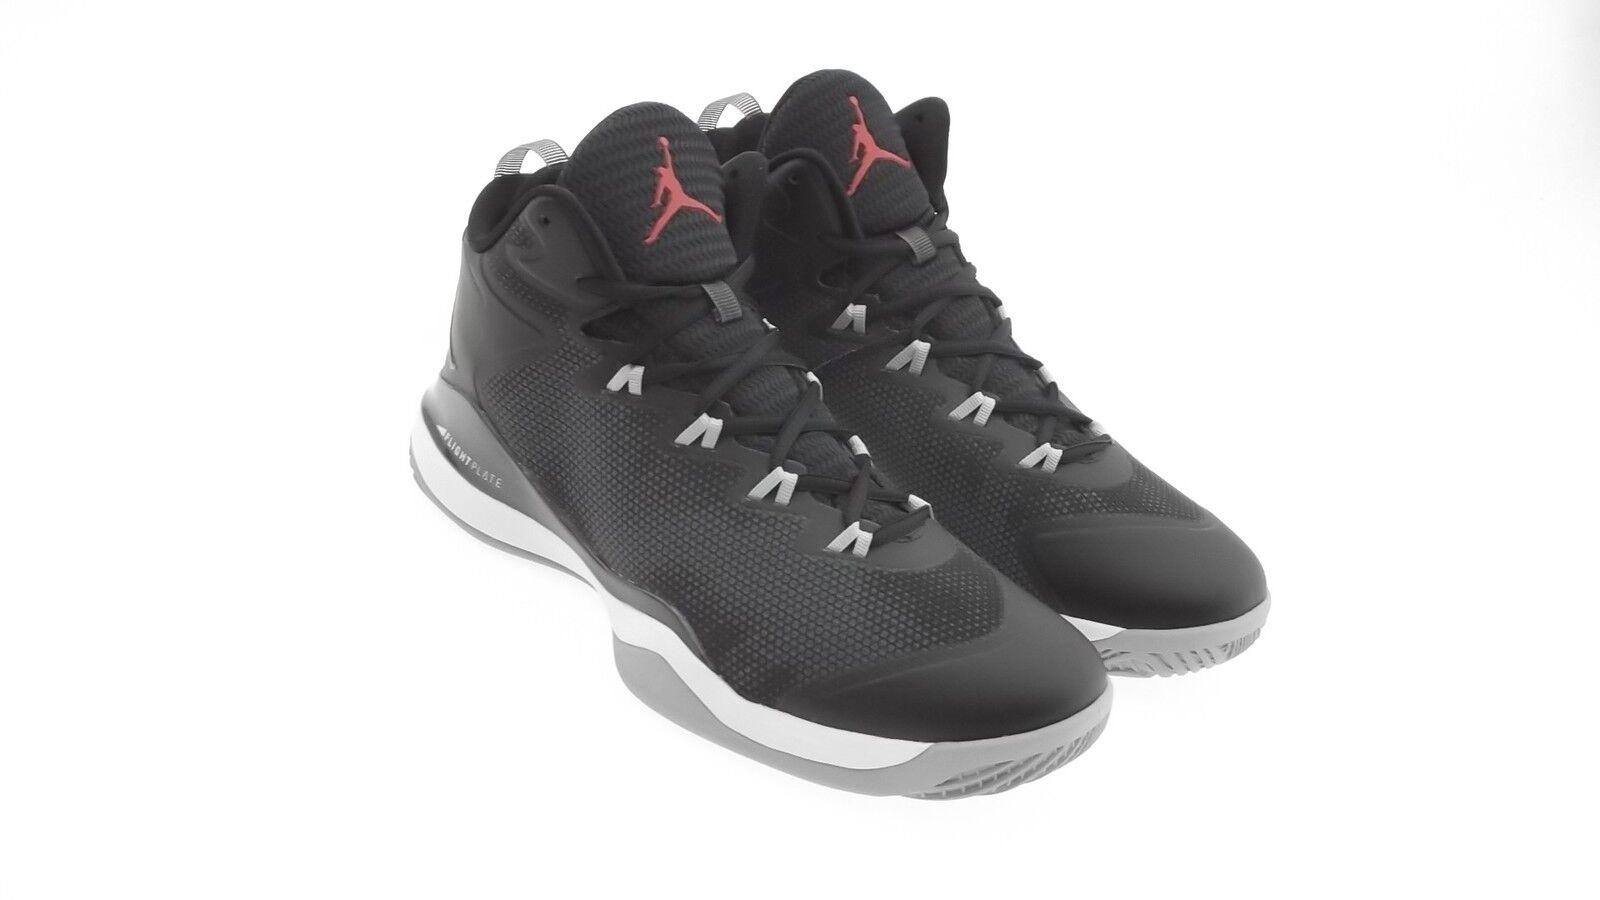 huge discount c463b 136d1 ... wholesale 139.99 684933 005 jordan hommes super fly 3 wolf noir dark  grey wolf 3 grey